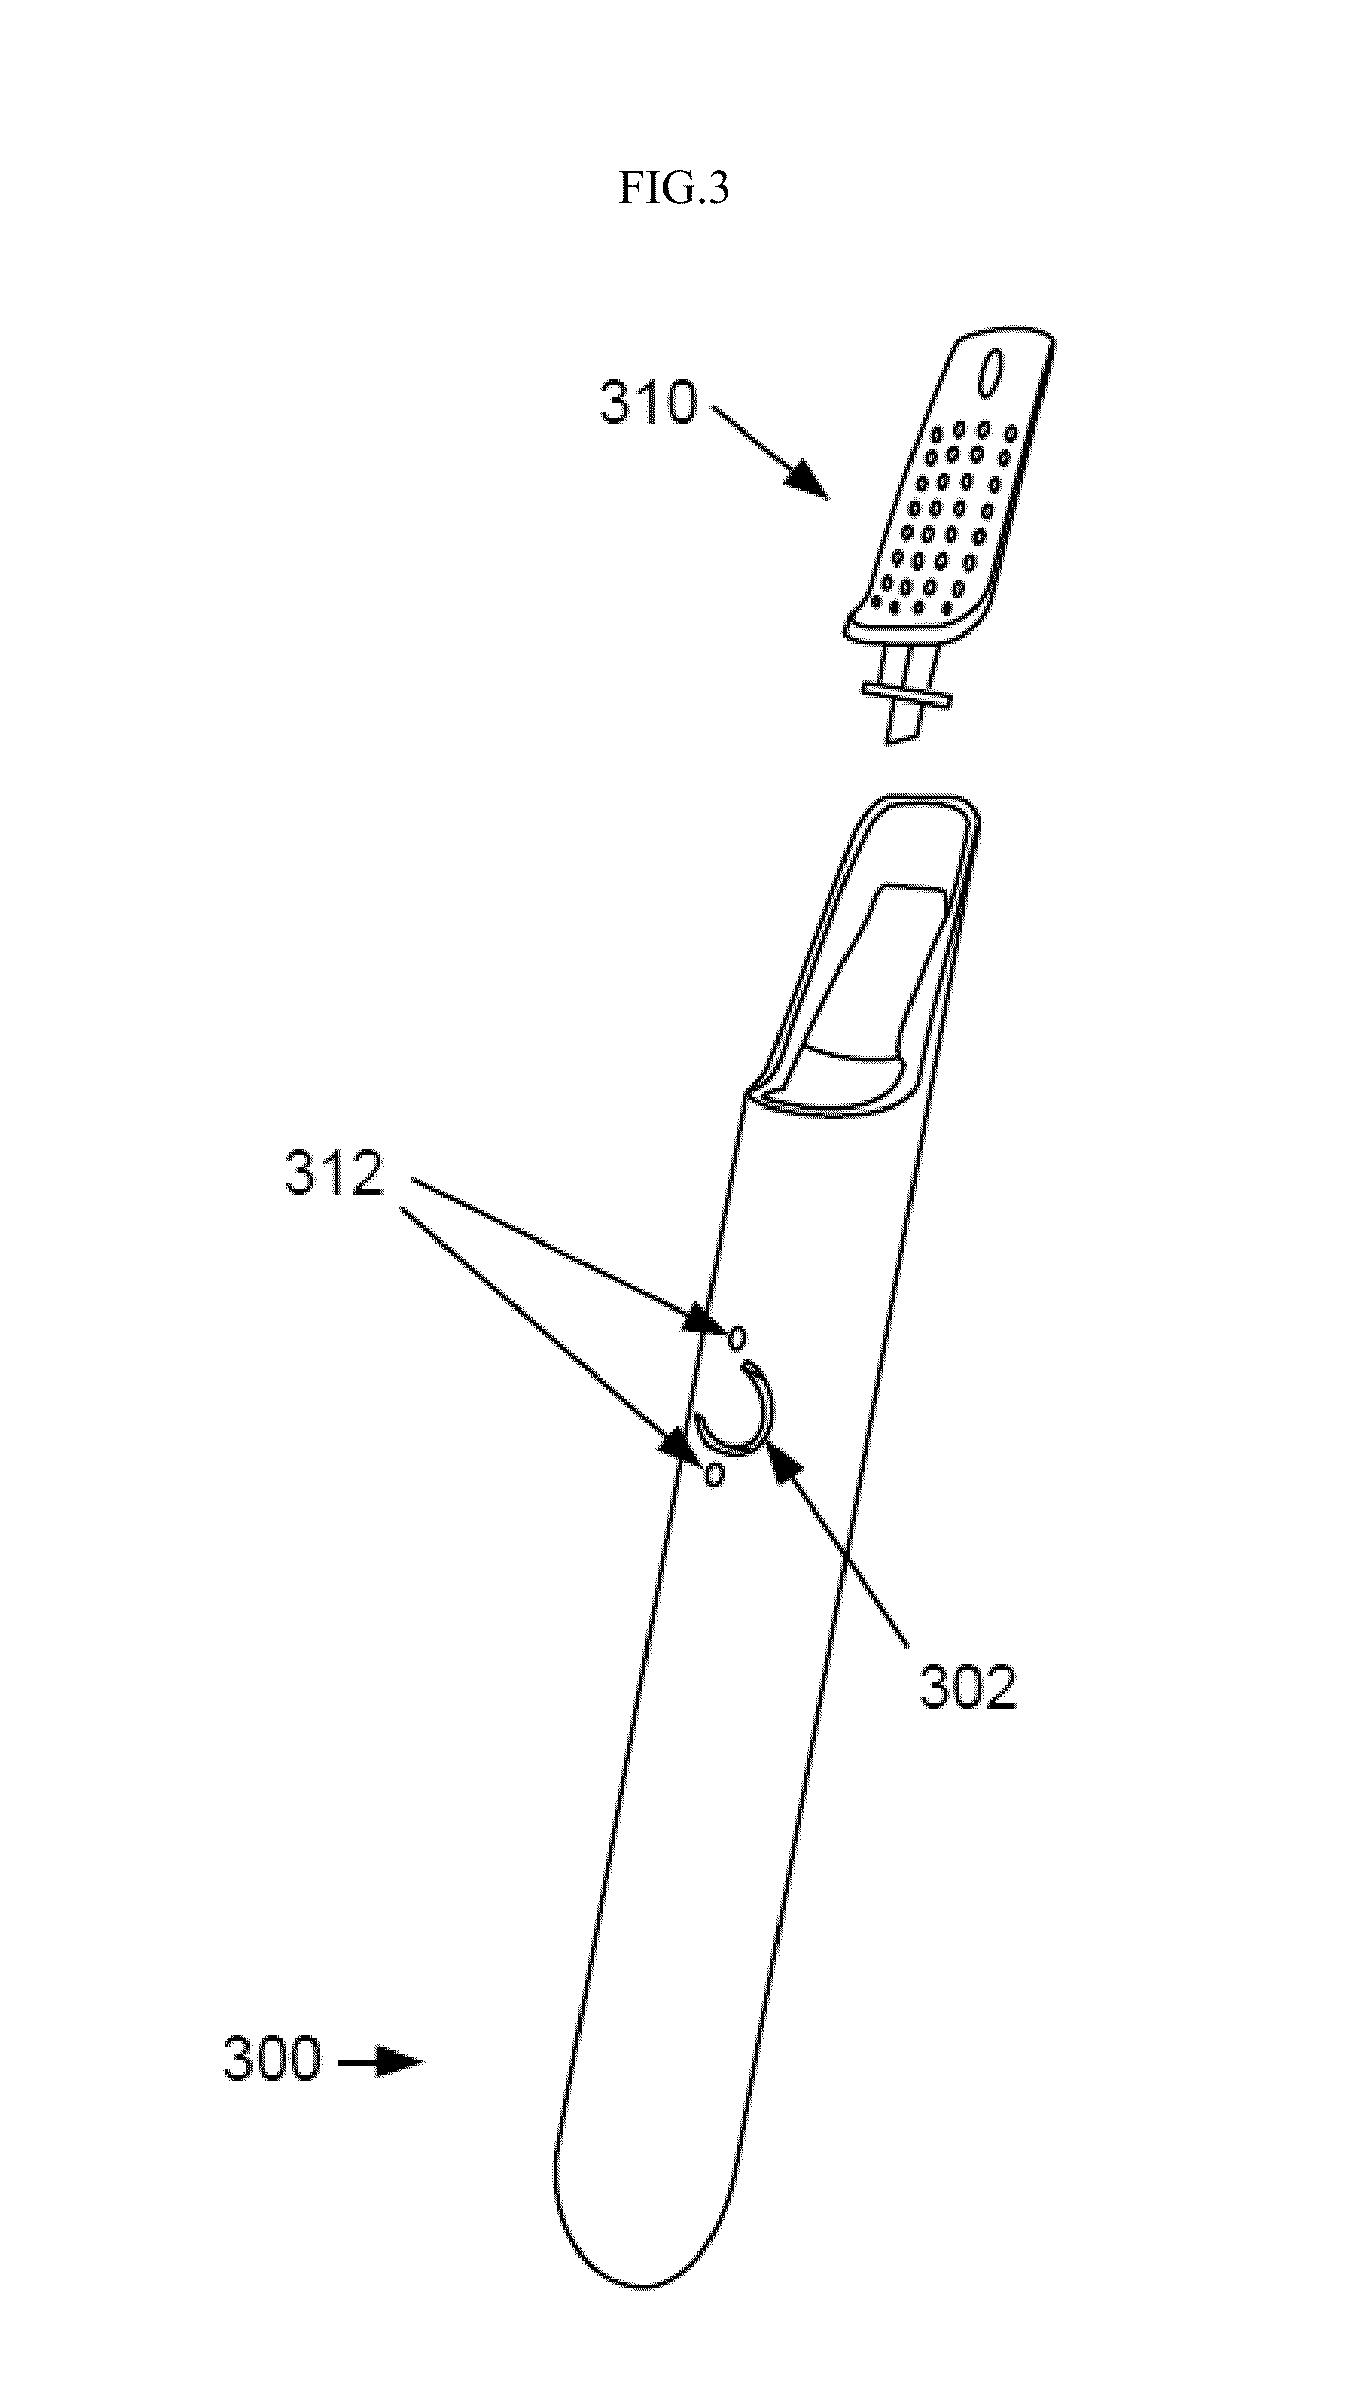 patente us20130042865